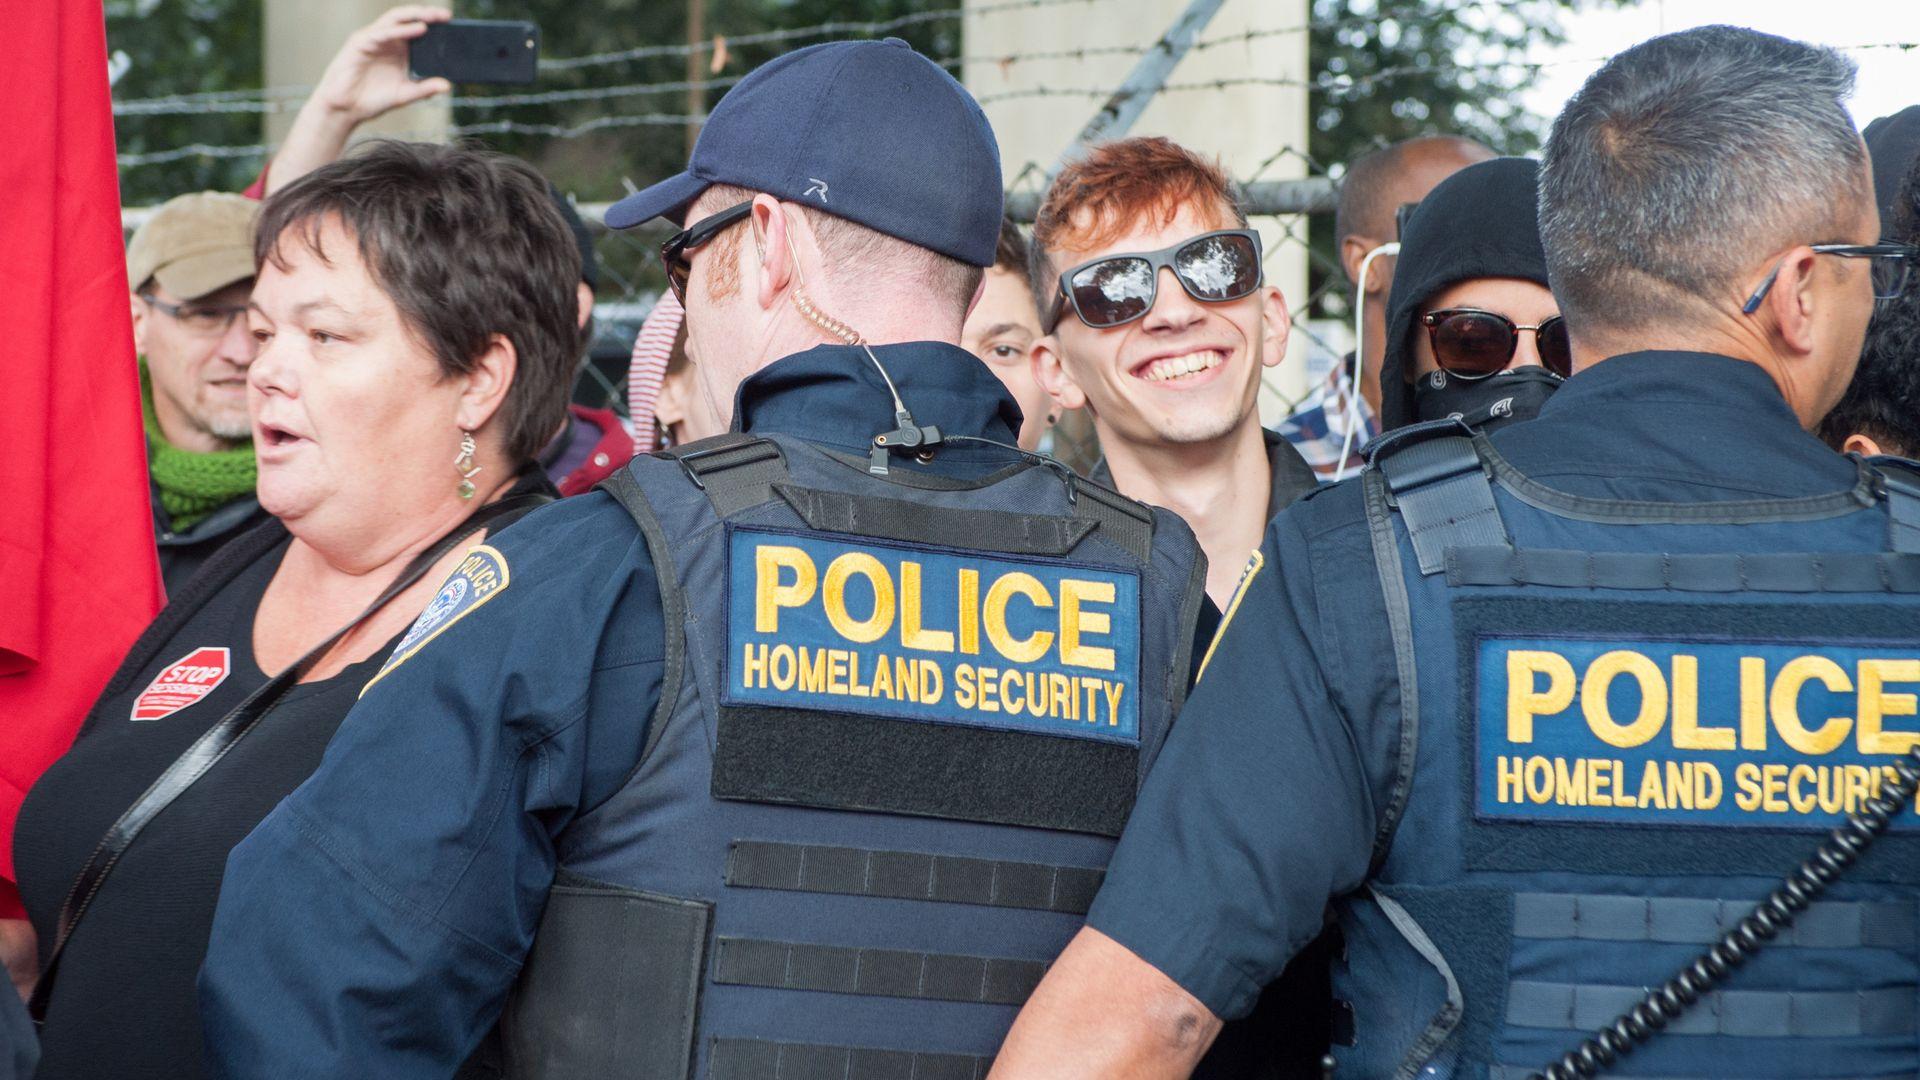 homeland security police block off protestors